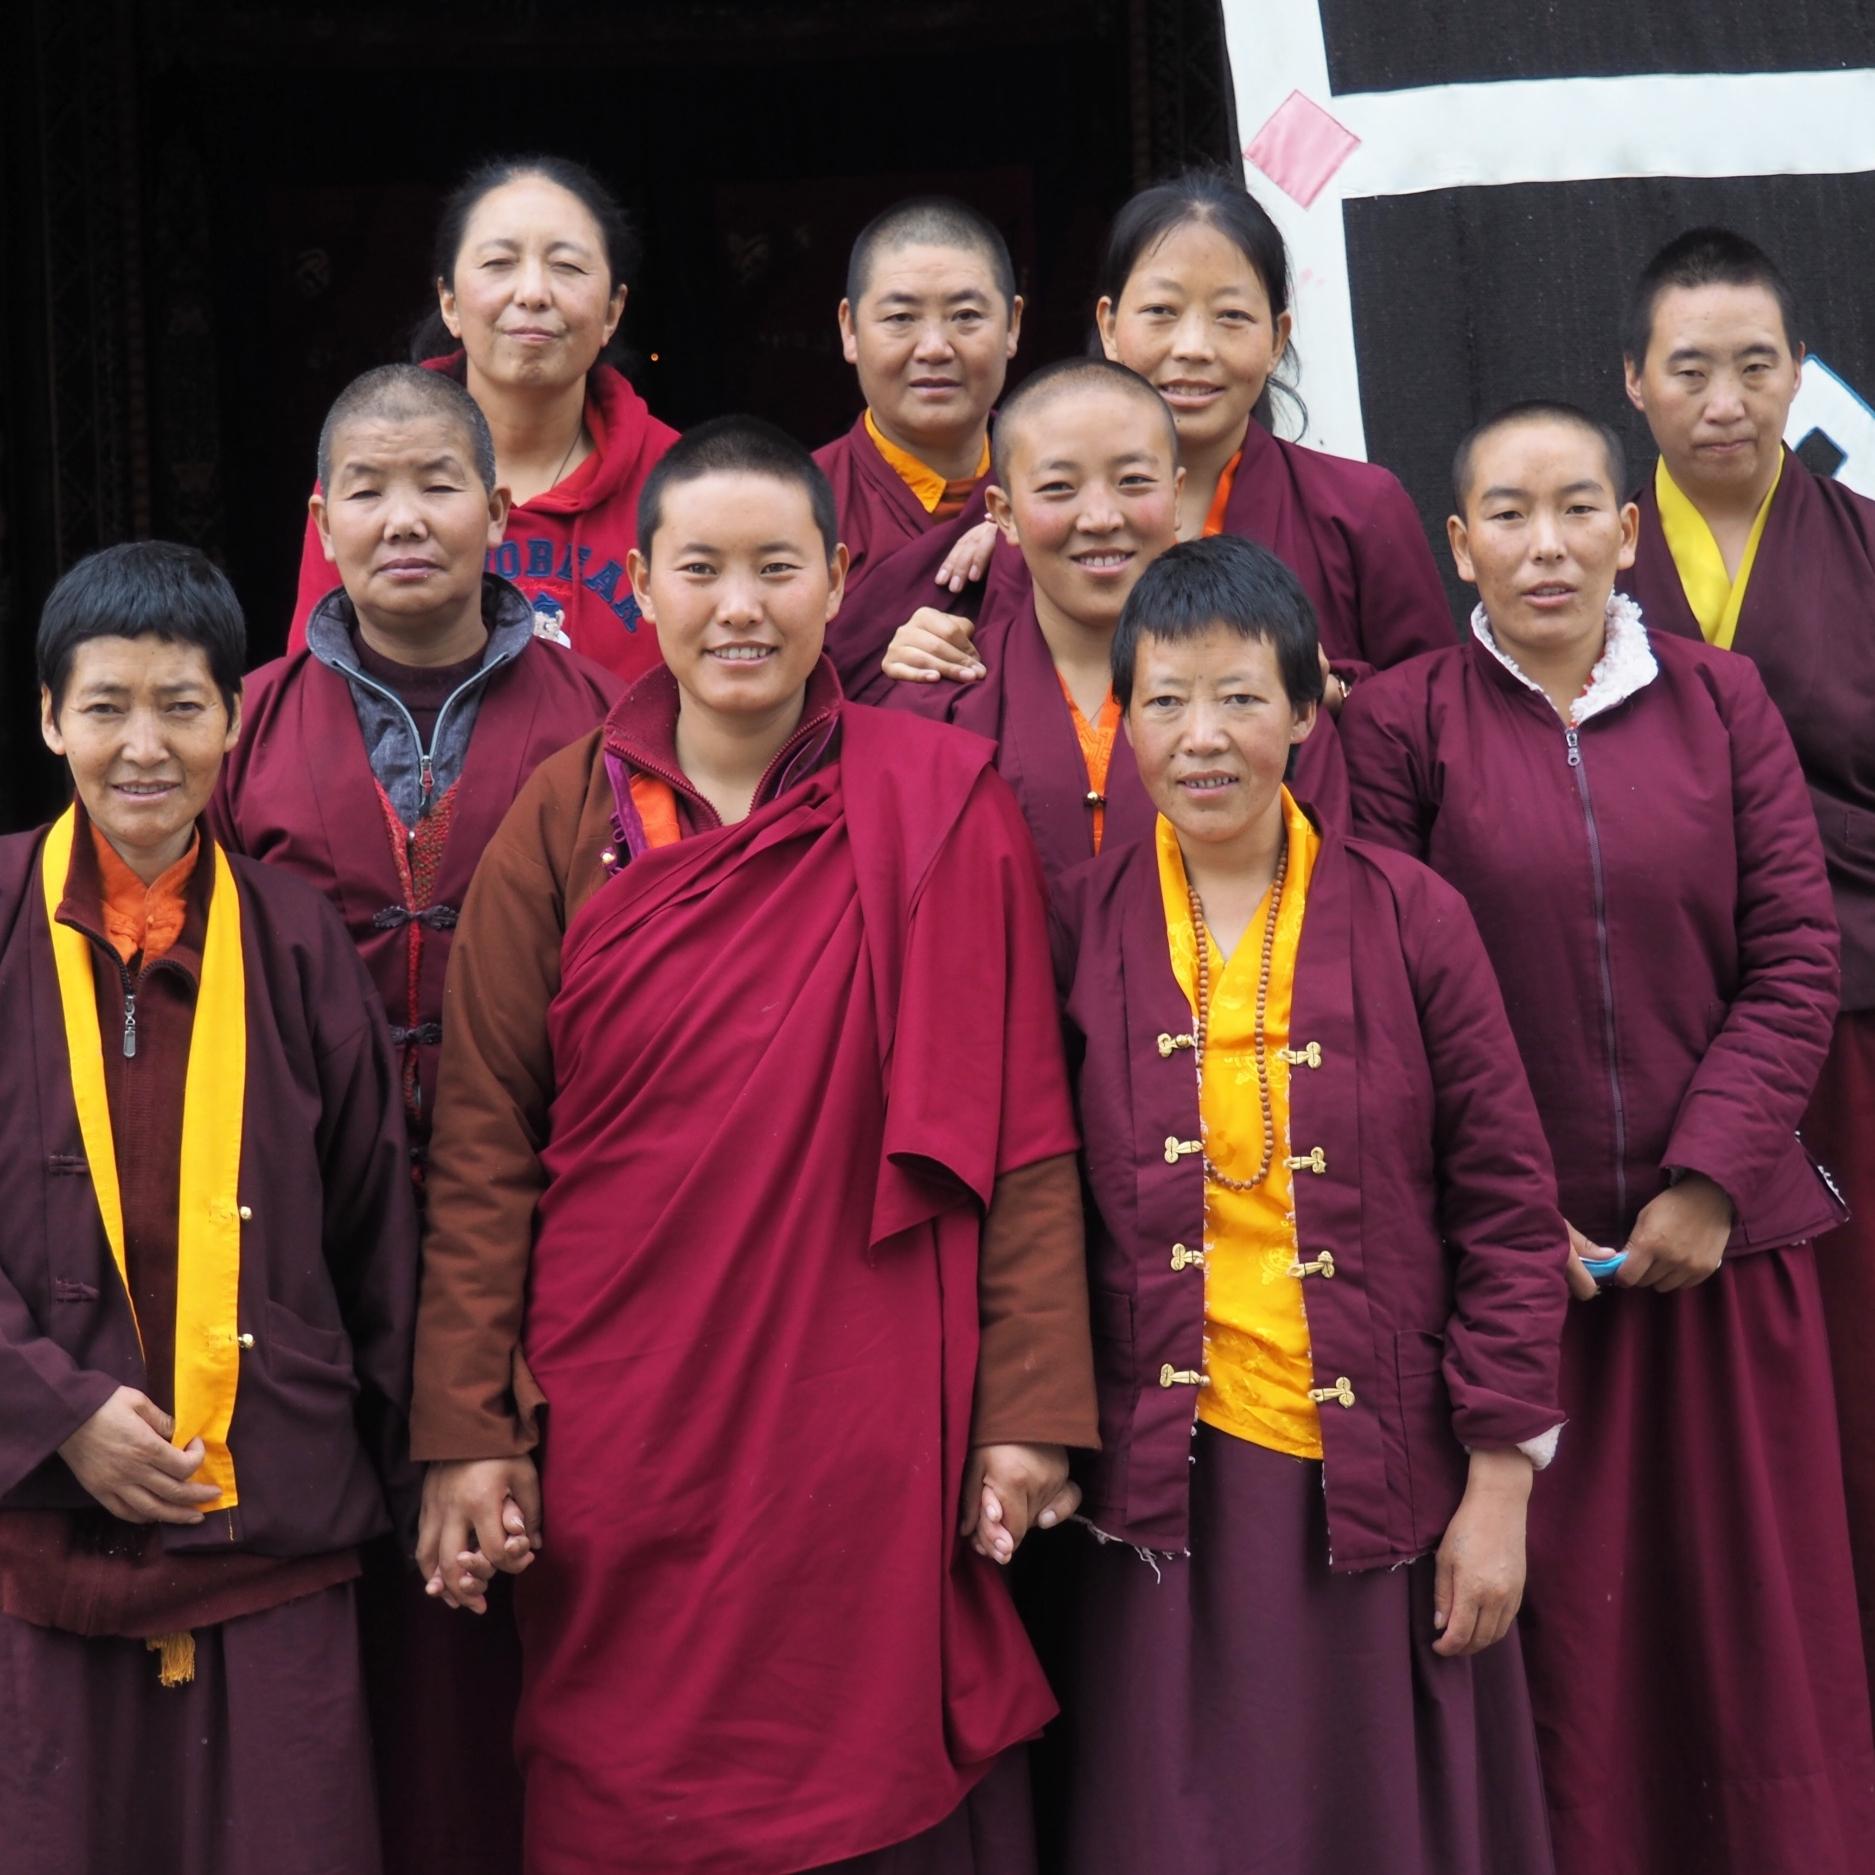 A few of the sixteen Tsogyal Nuns, June 2017